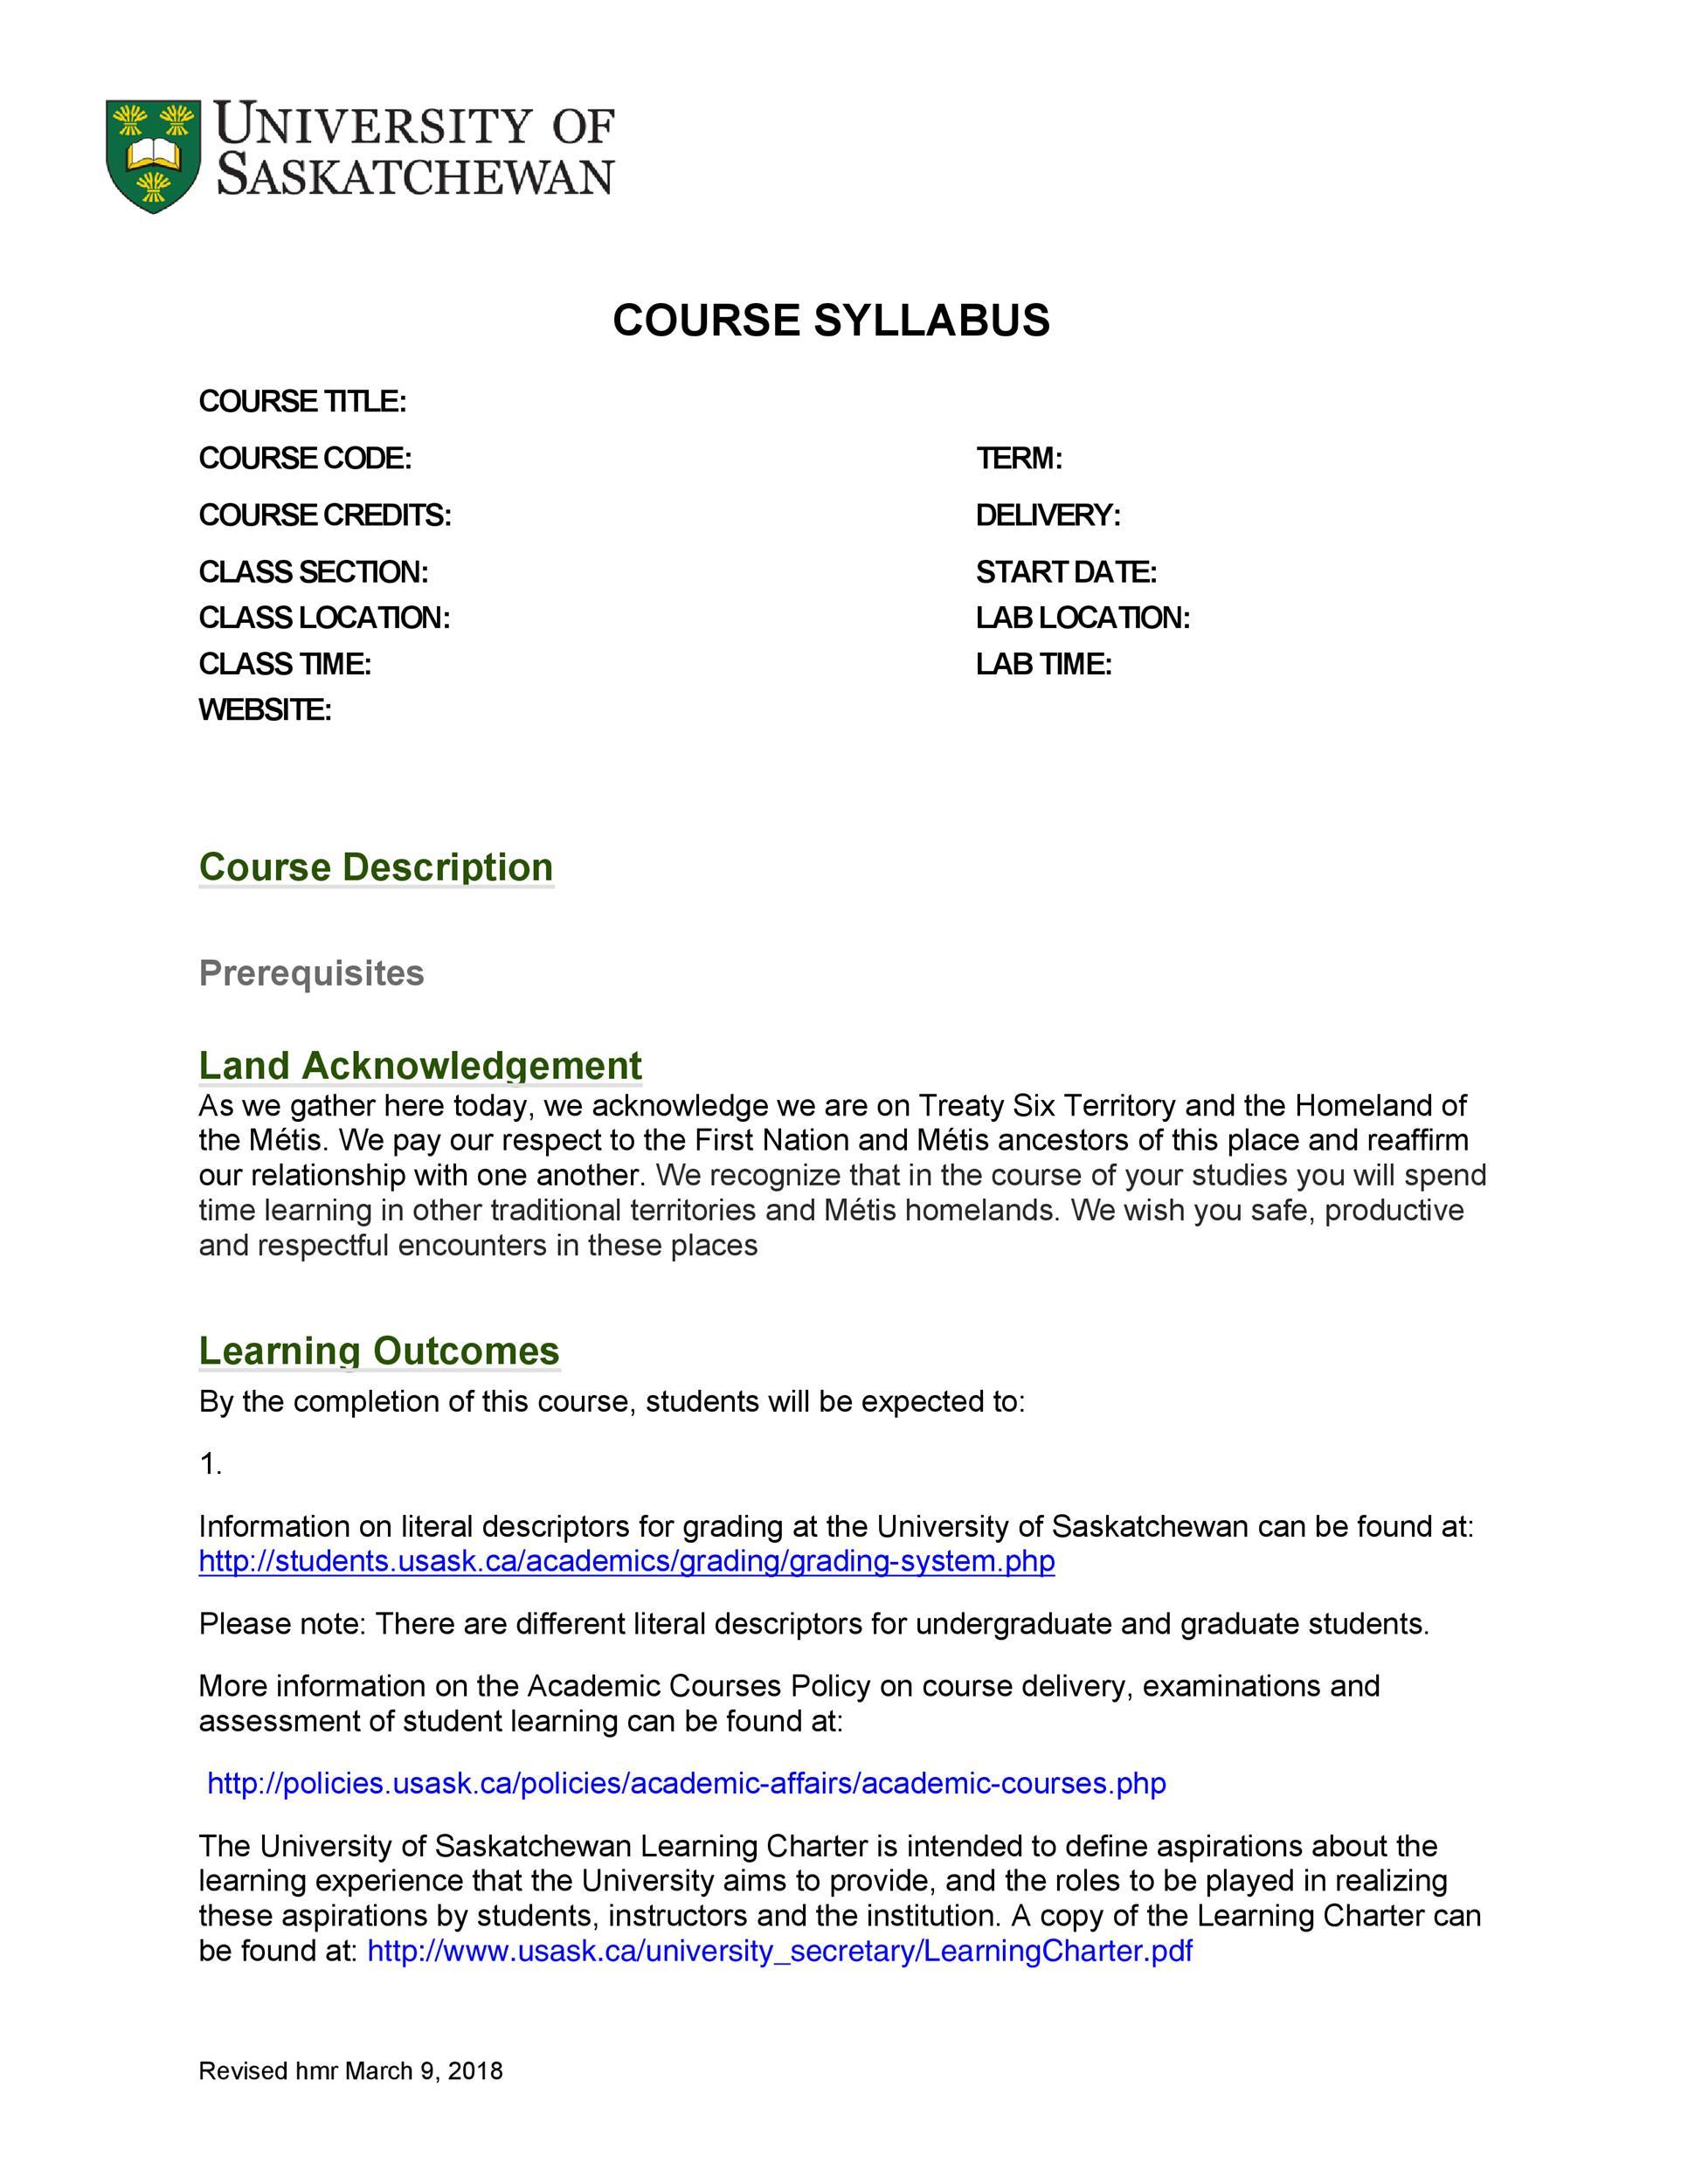 Free sylabus template 40